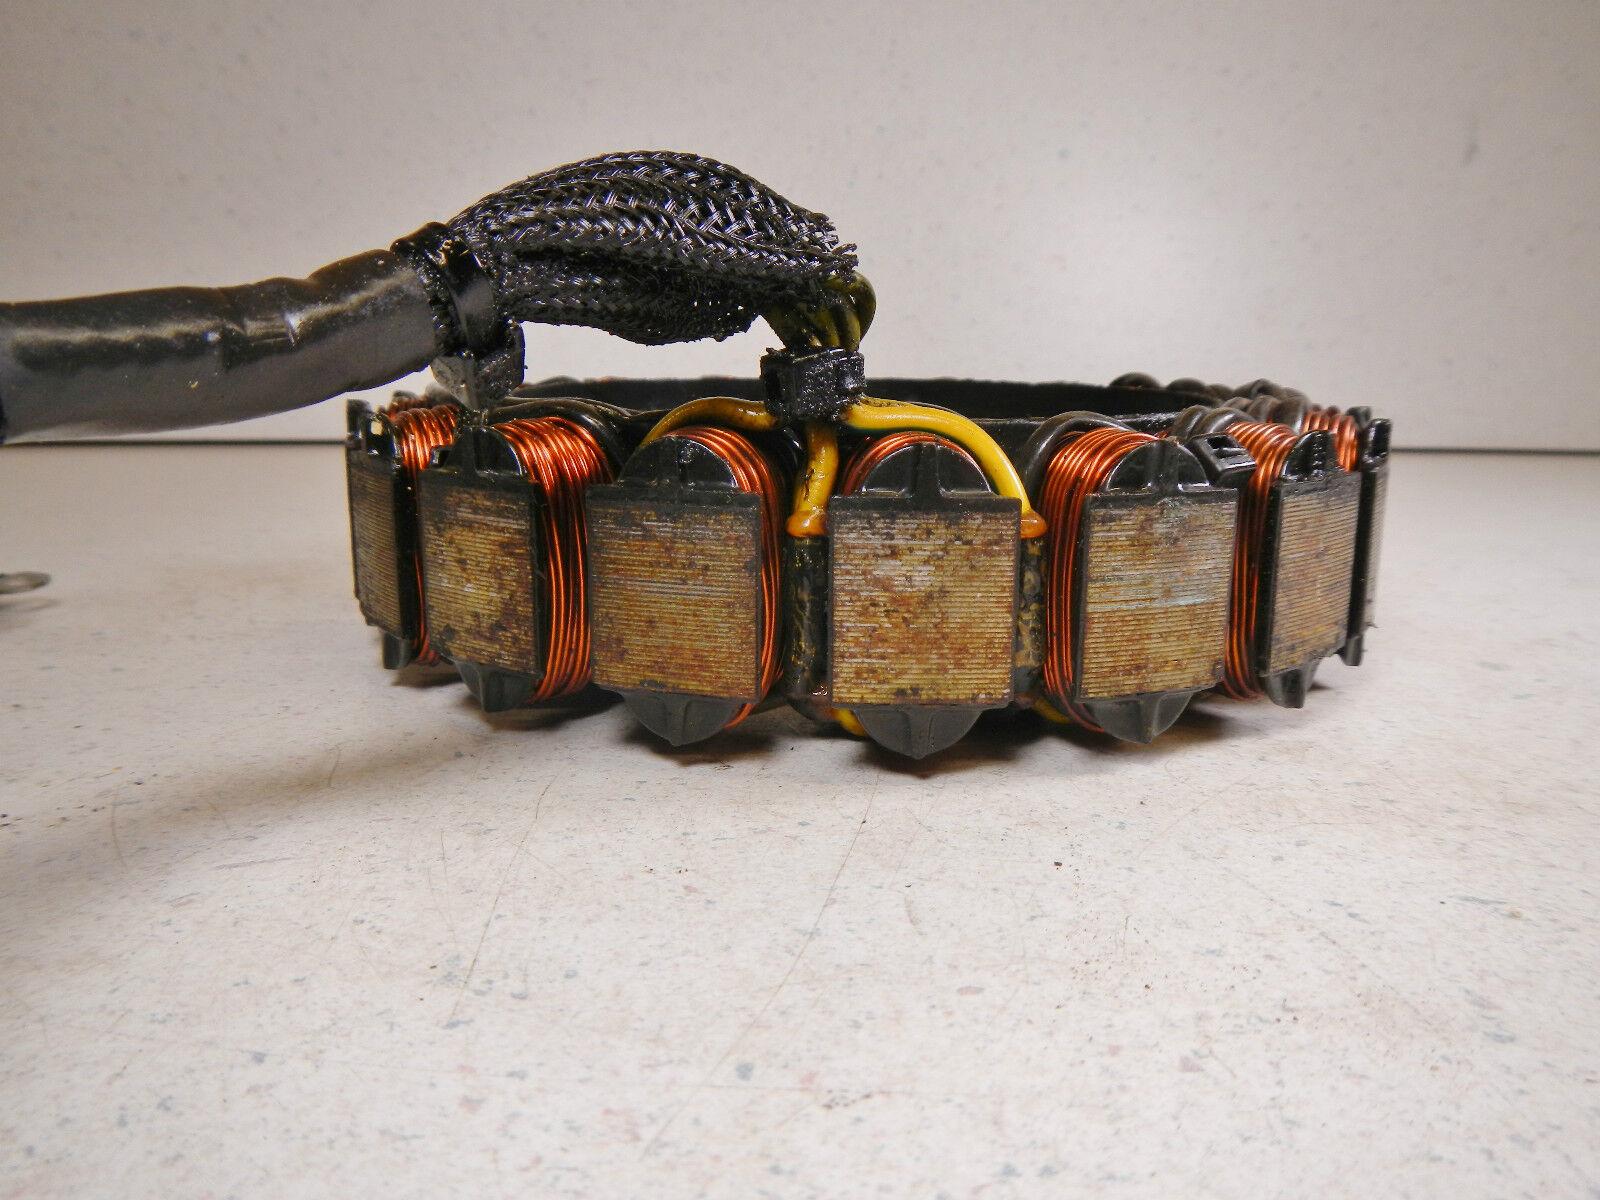 99 Omc Evinrude 115 Stator Ladesystem Lichtmaschine Generator Ladesystem Stator 9c1f92